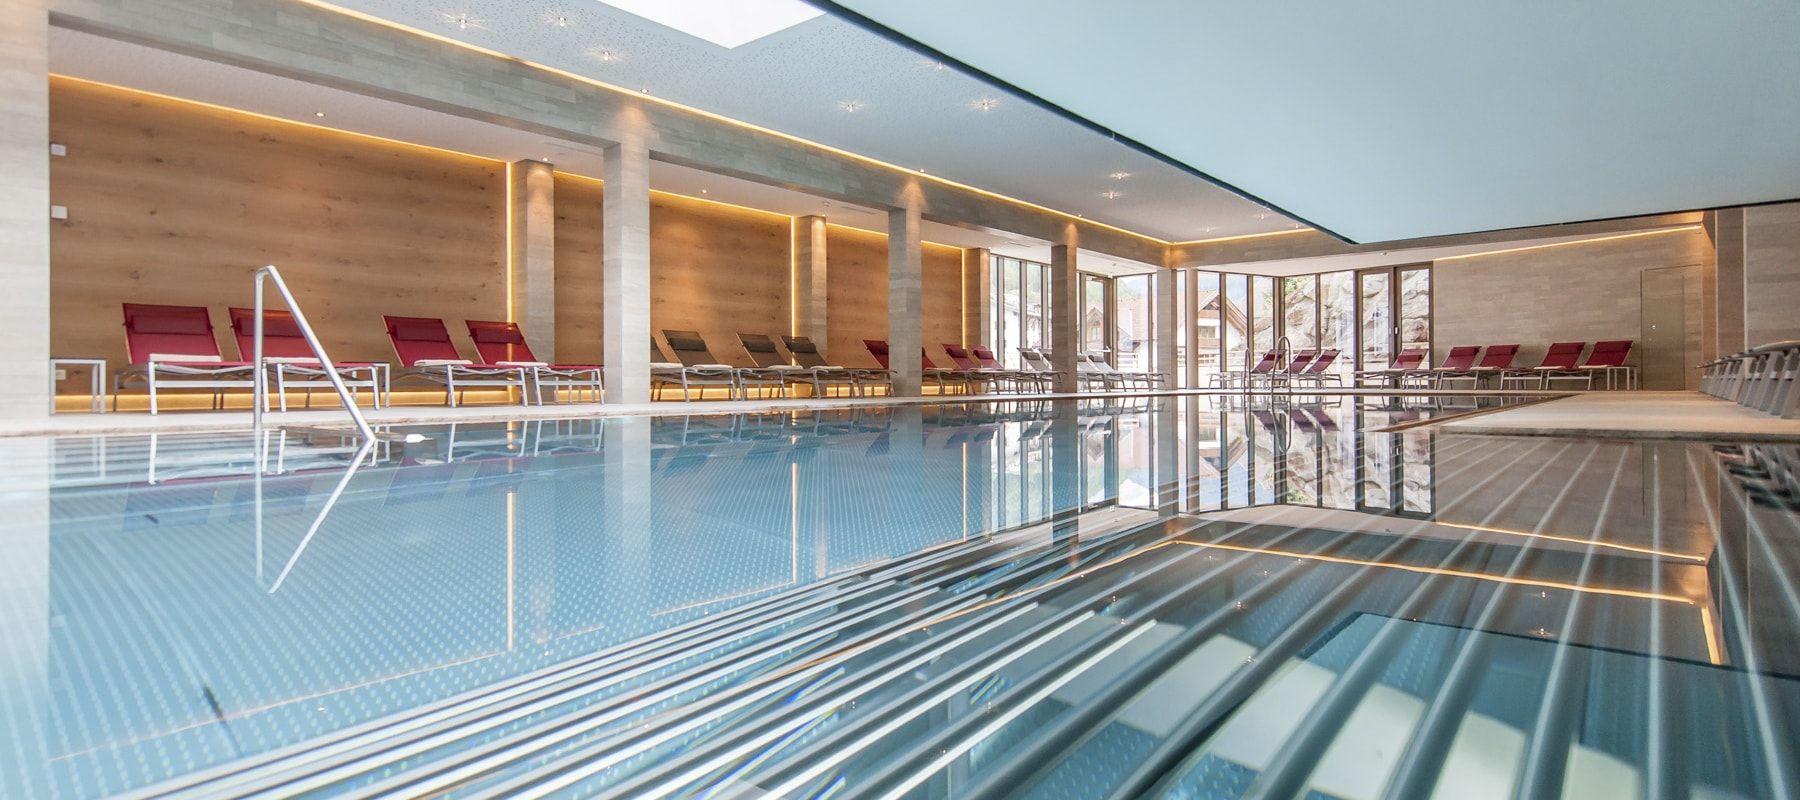 Hotel Tyrolerhof Indoorpool